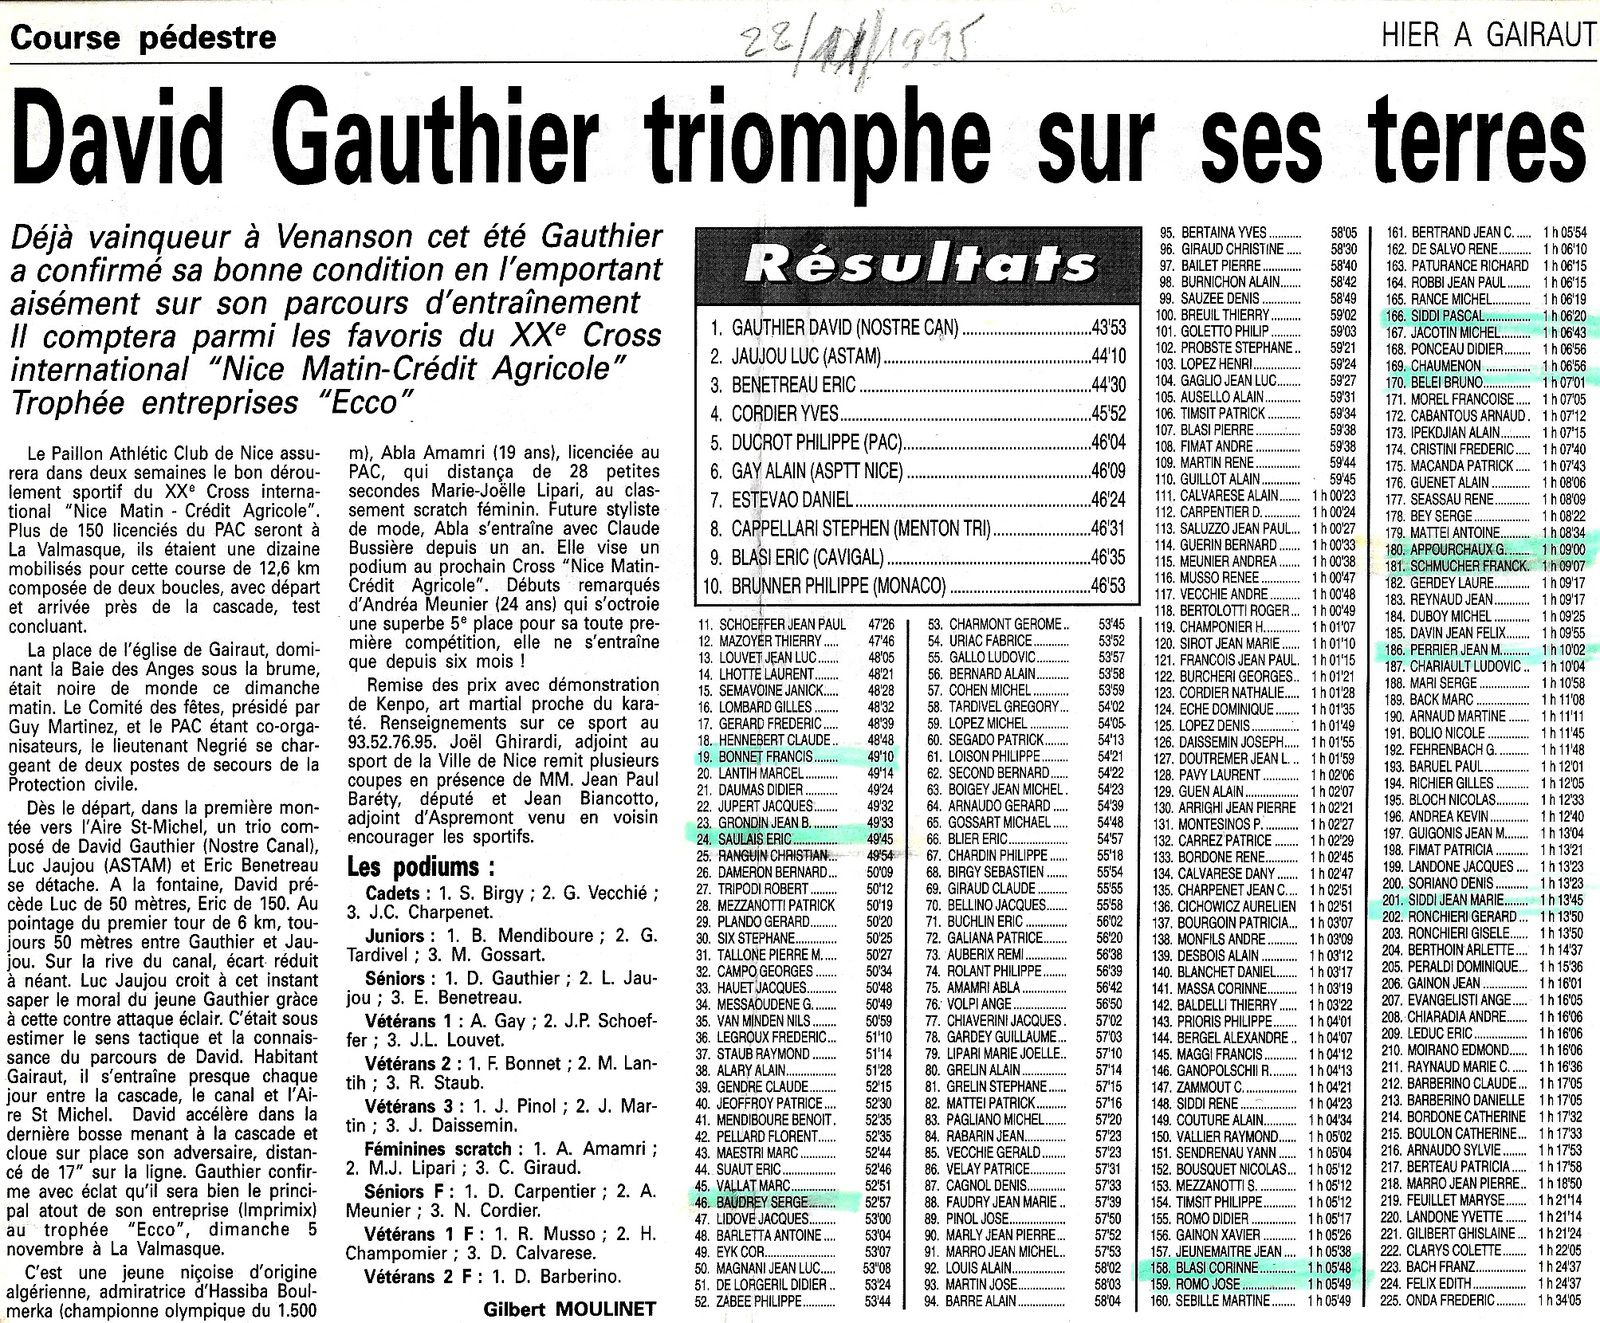 NICE GRAND PRIX DE GAIRAUT. 22.11.1995